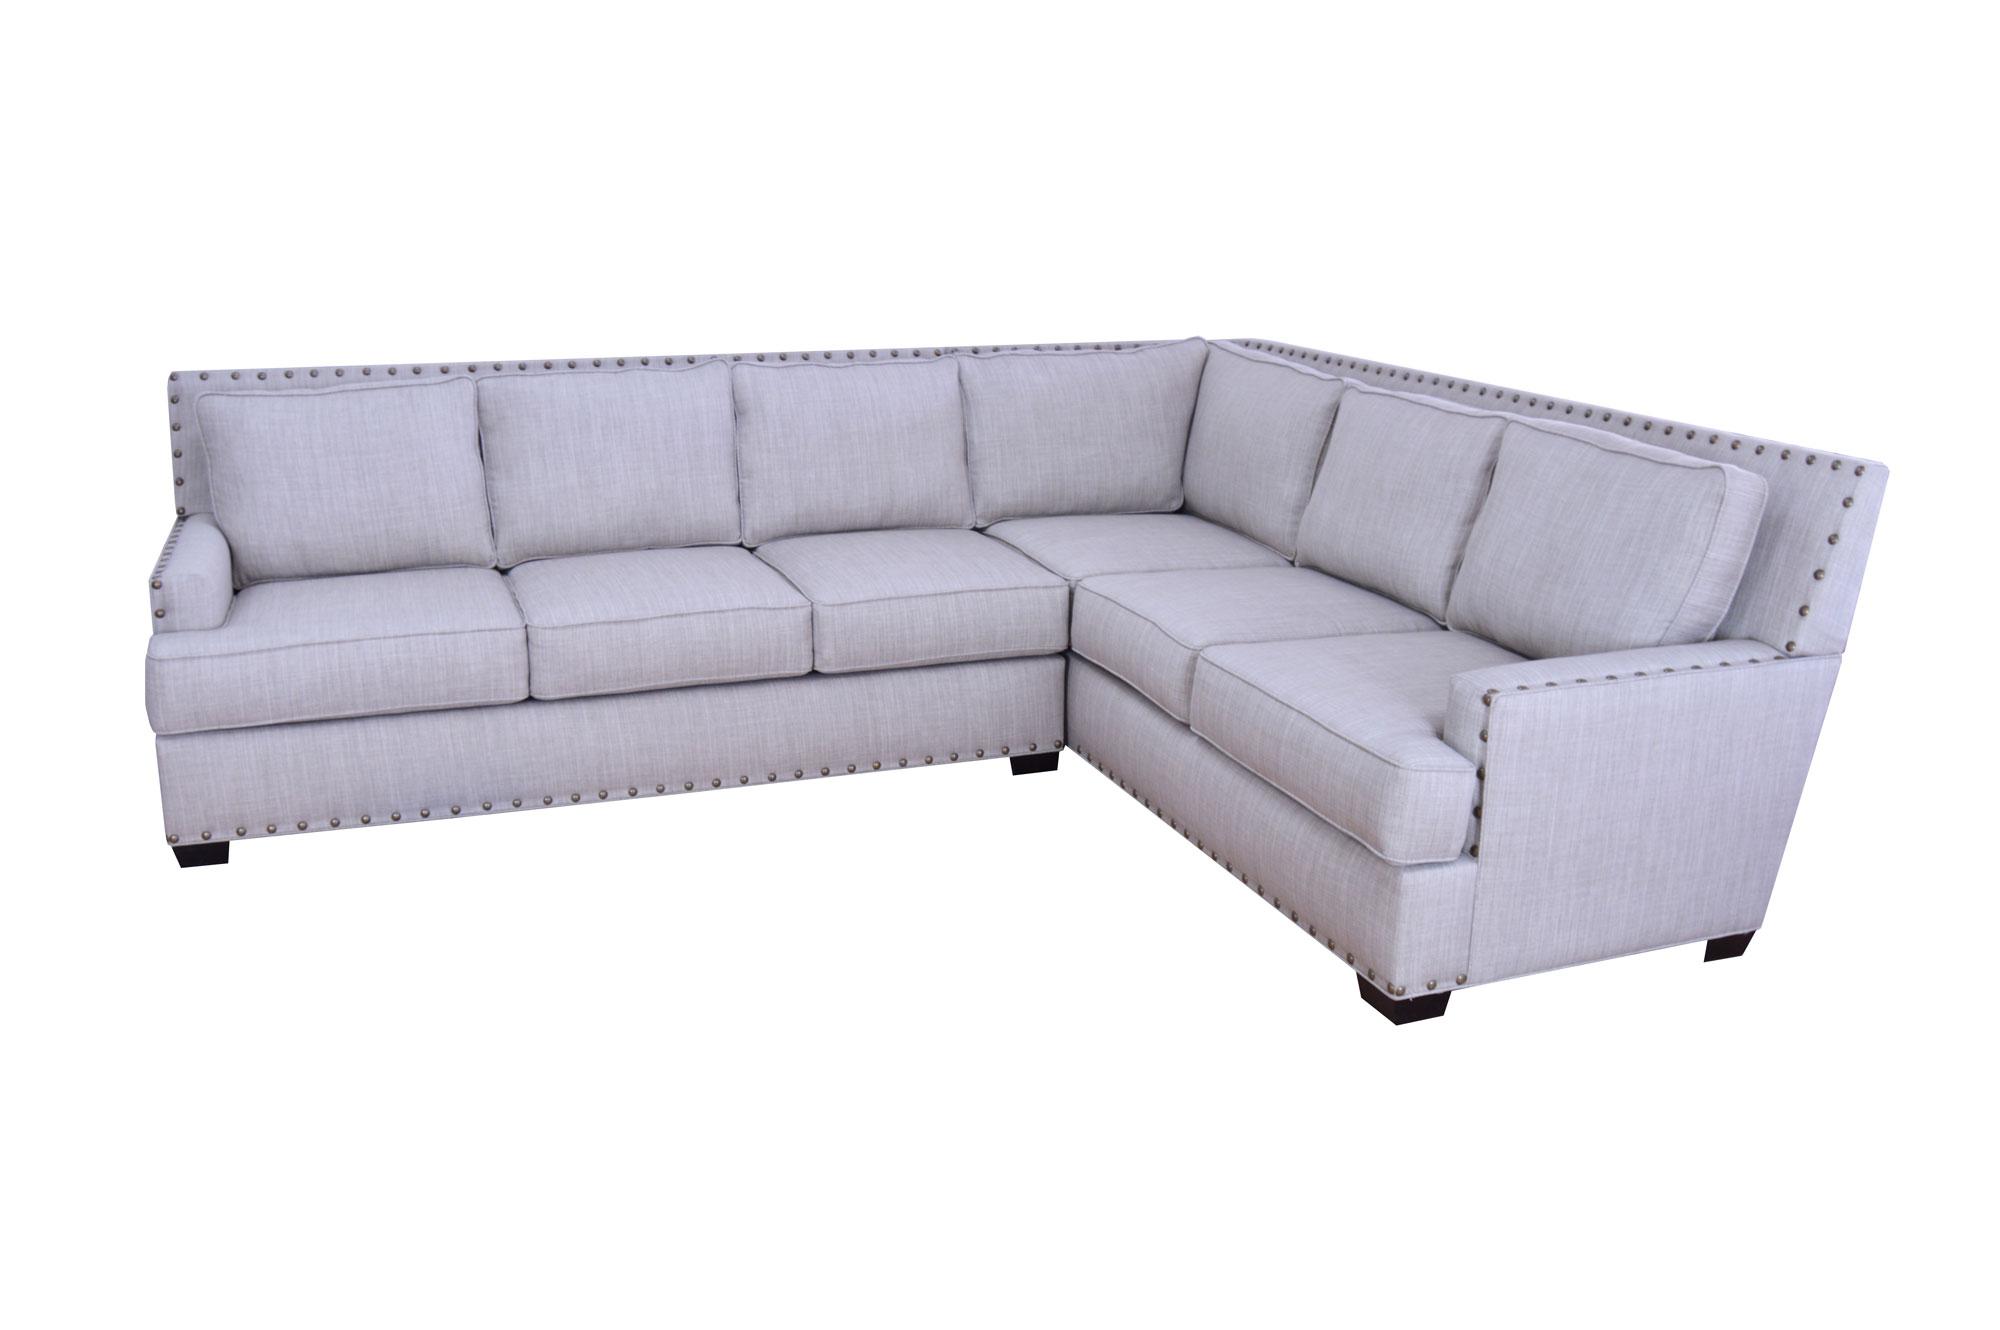 Sofa Sets Amp Sectional Sofas Custom Sofas 4 Less Santa